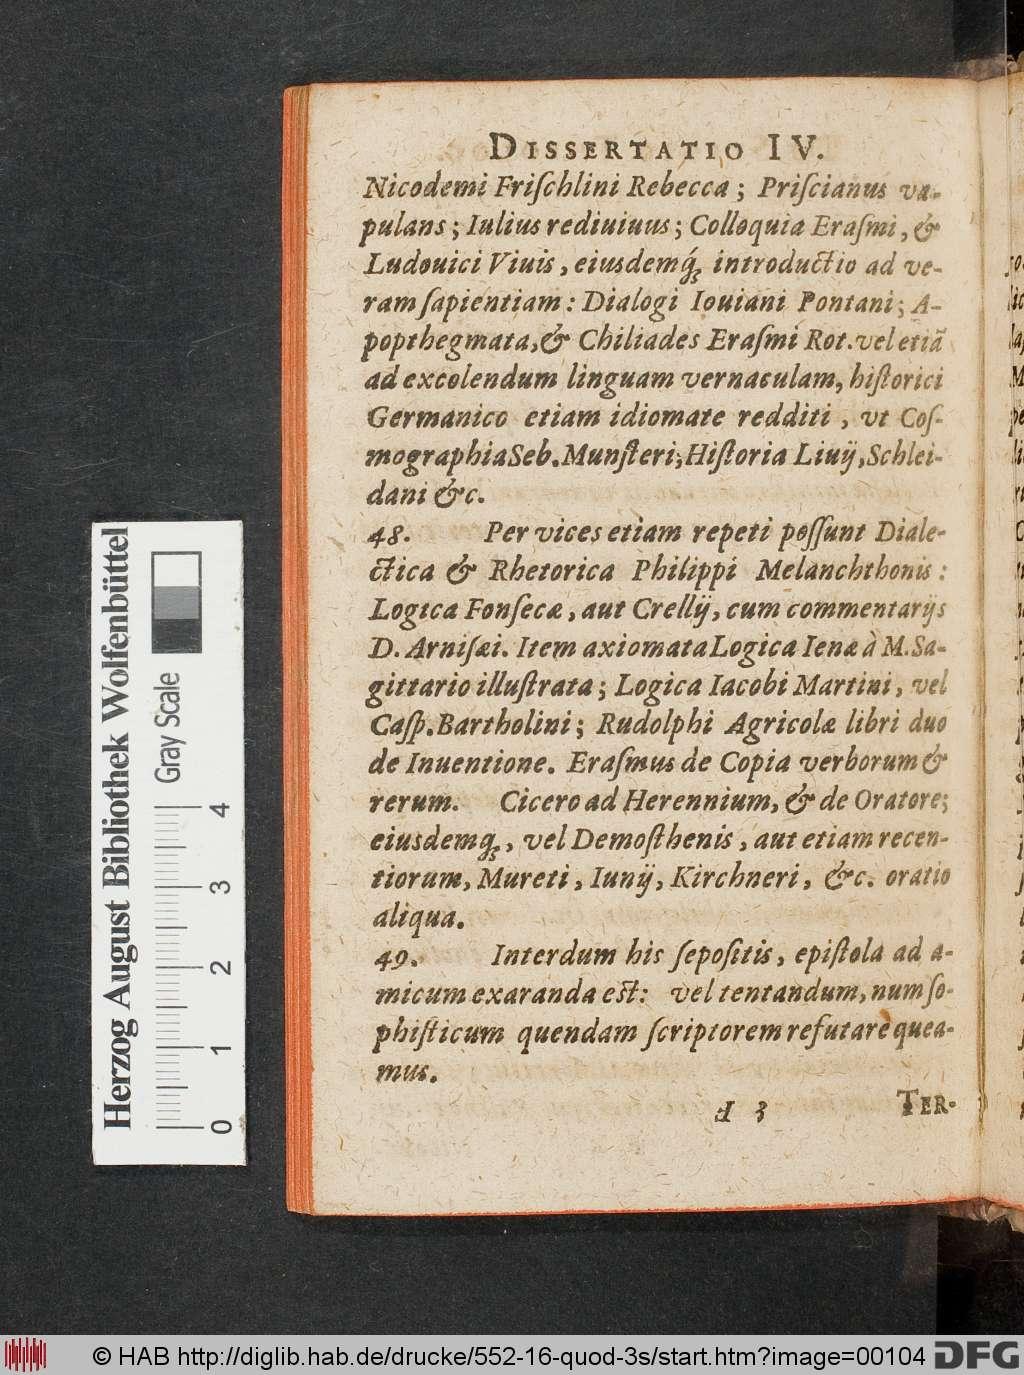 http://diglib.hab.de/drucke/552-16-quod-3s/00104.jpg